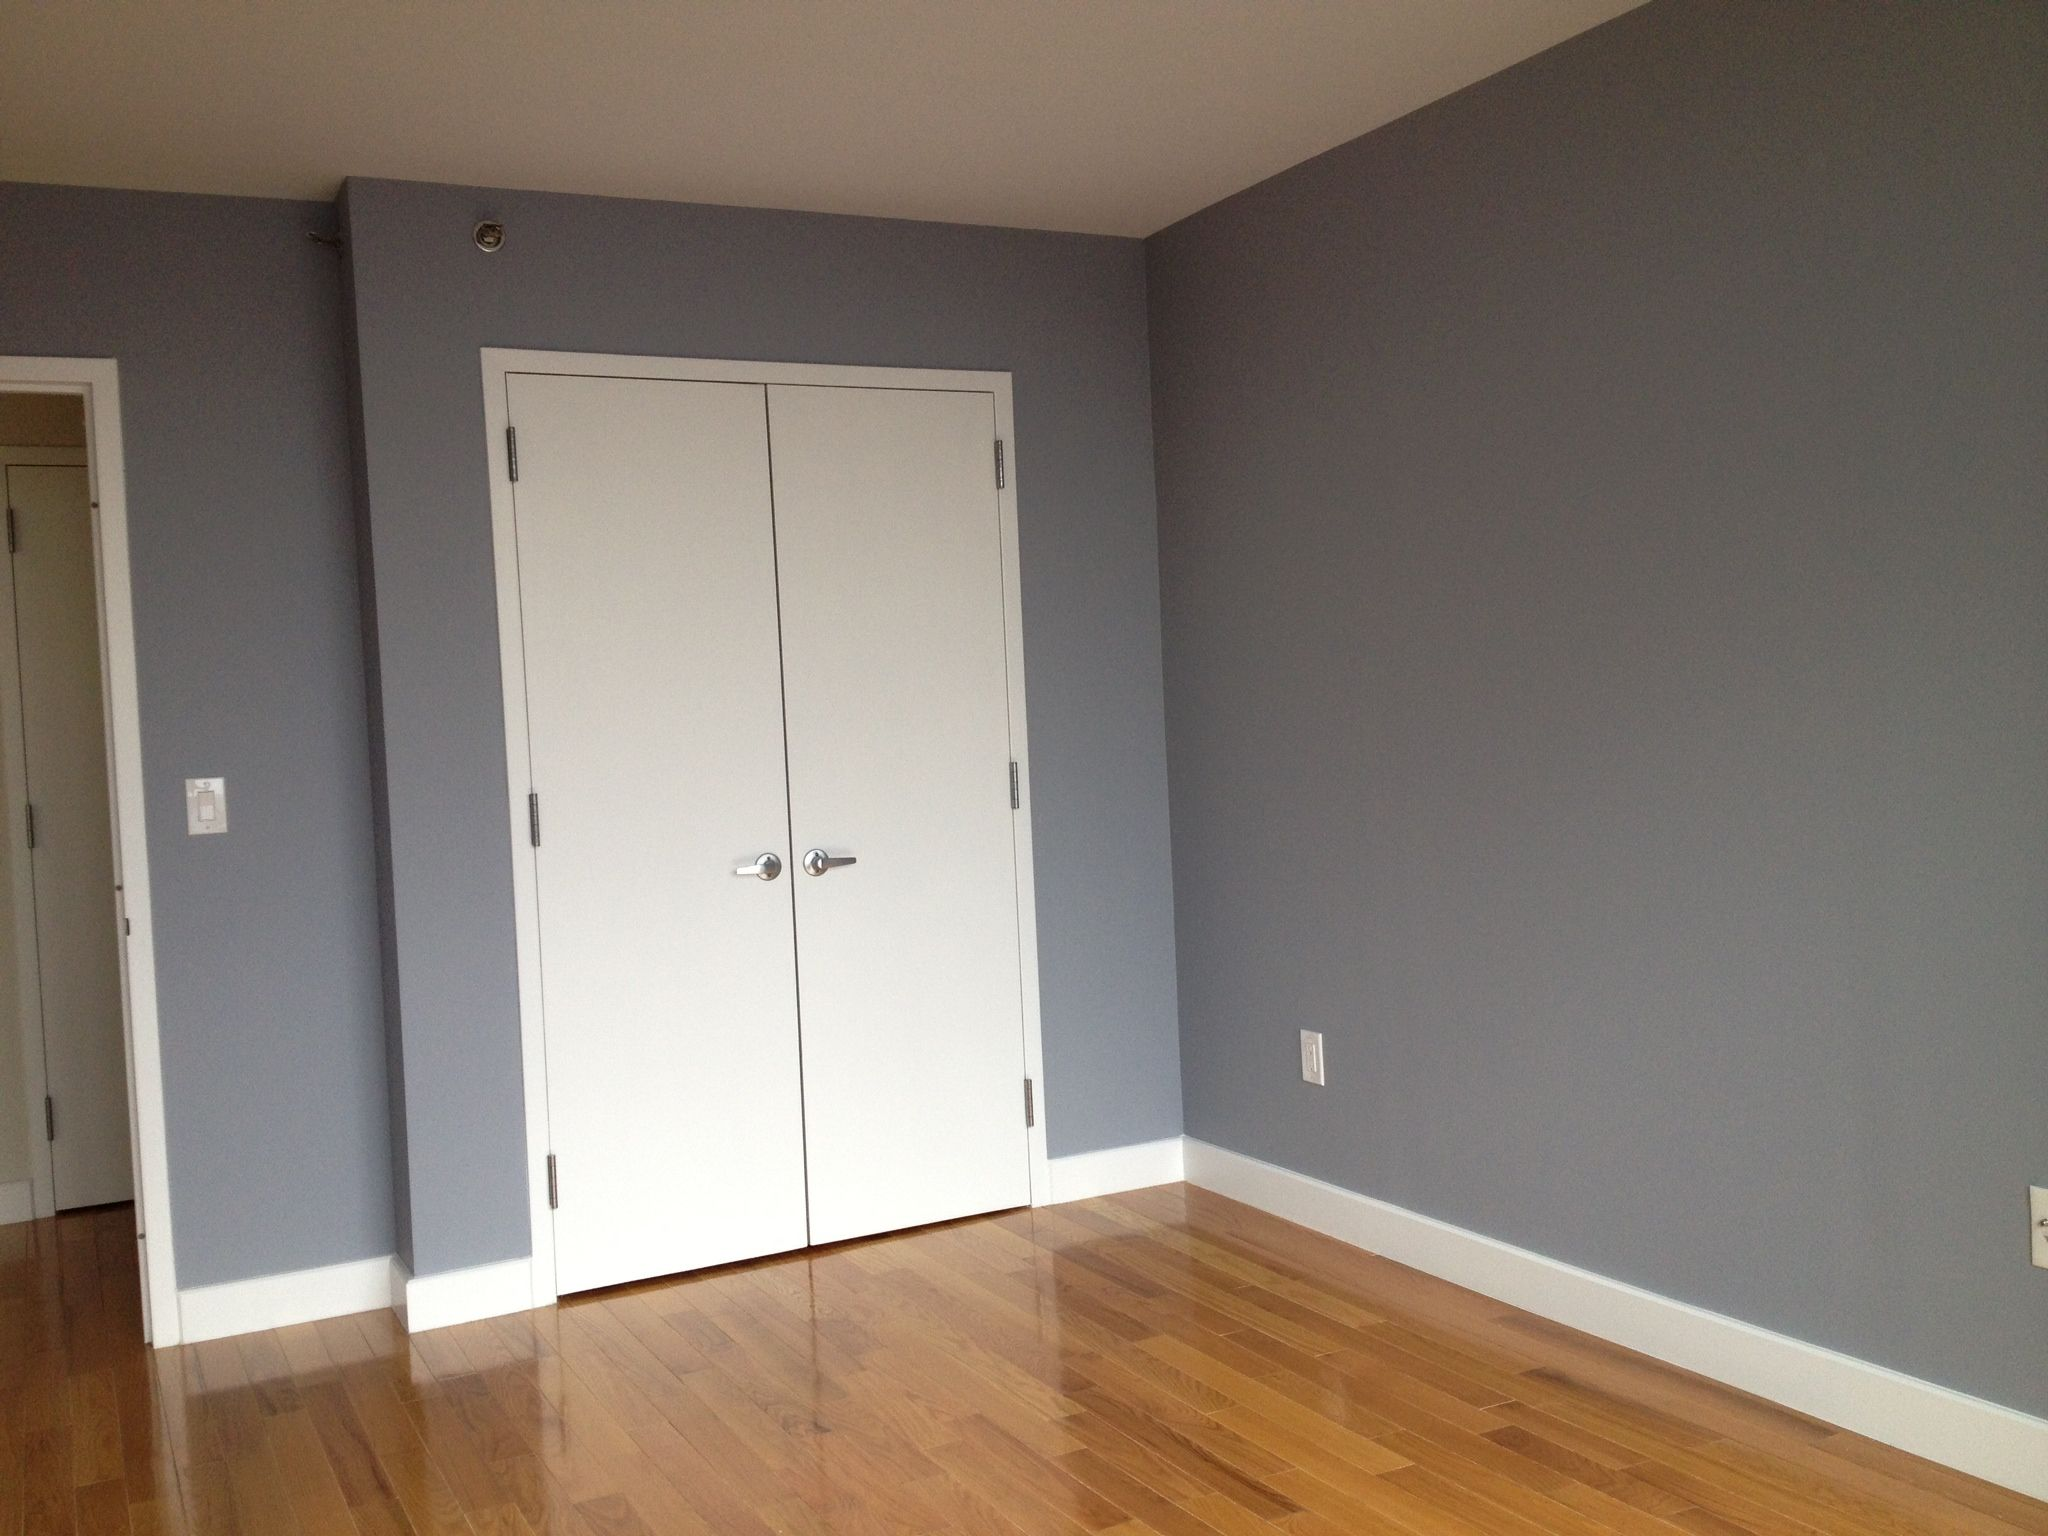 painted walls benjamin moore nickel gray paint colors. Black Bedroom Furniture Sets. Home Design Ideas